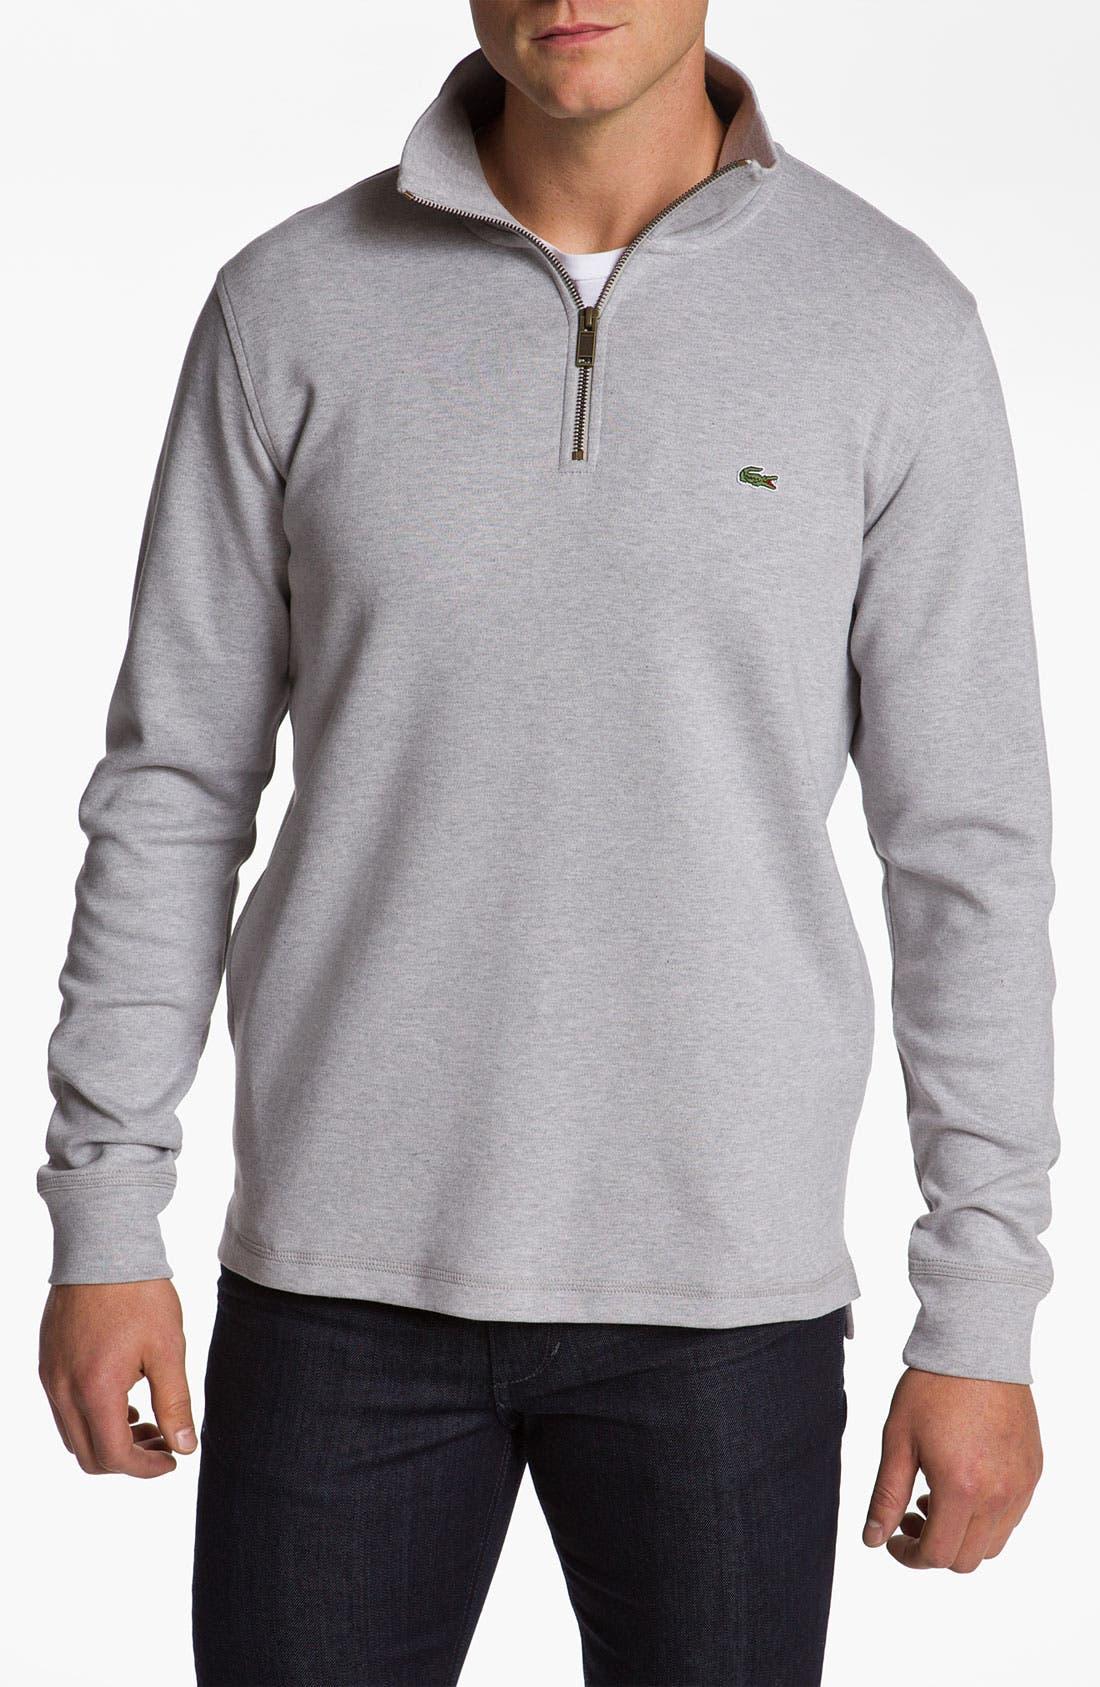 Main Image - Lacoste Half Zip Pullover